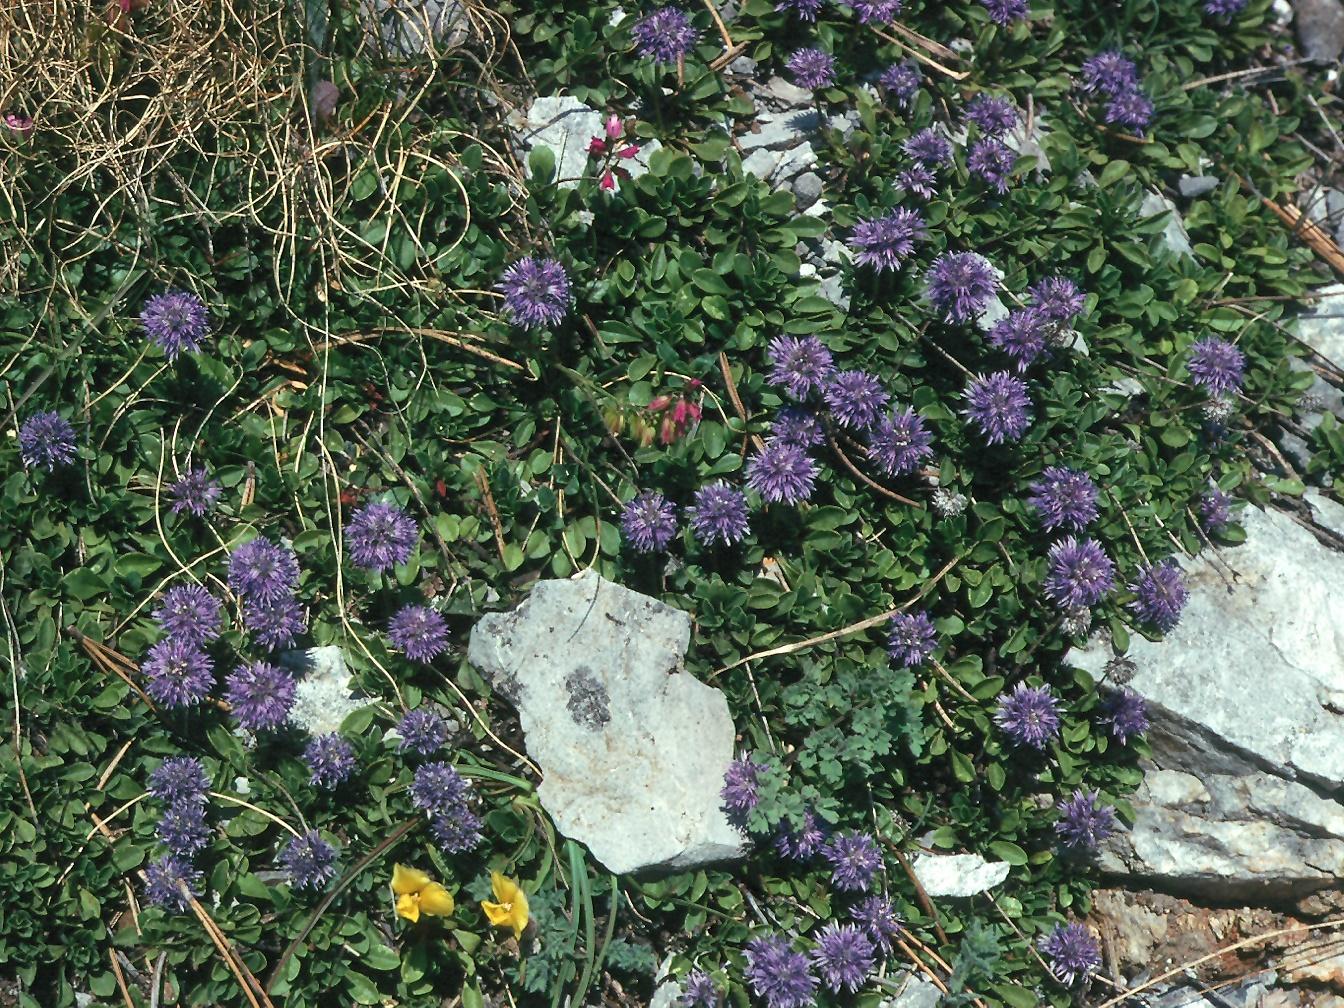 Globularia bellidifolia